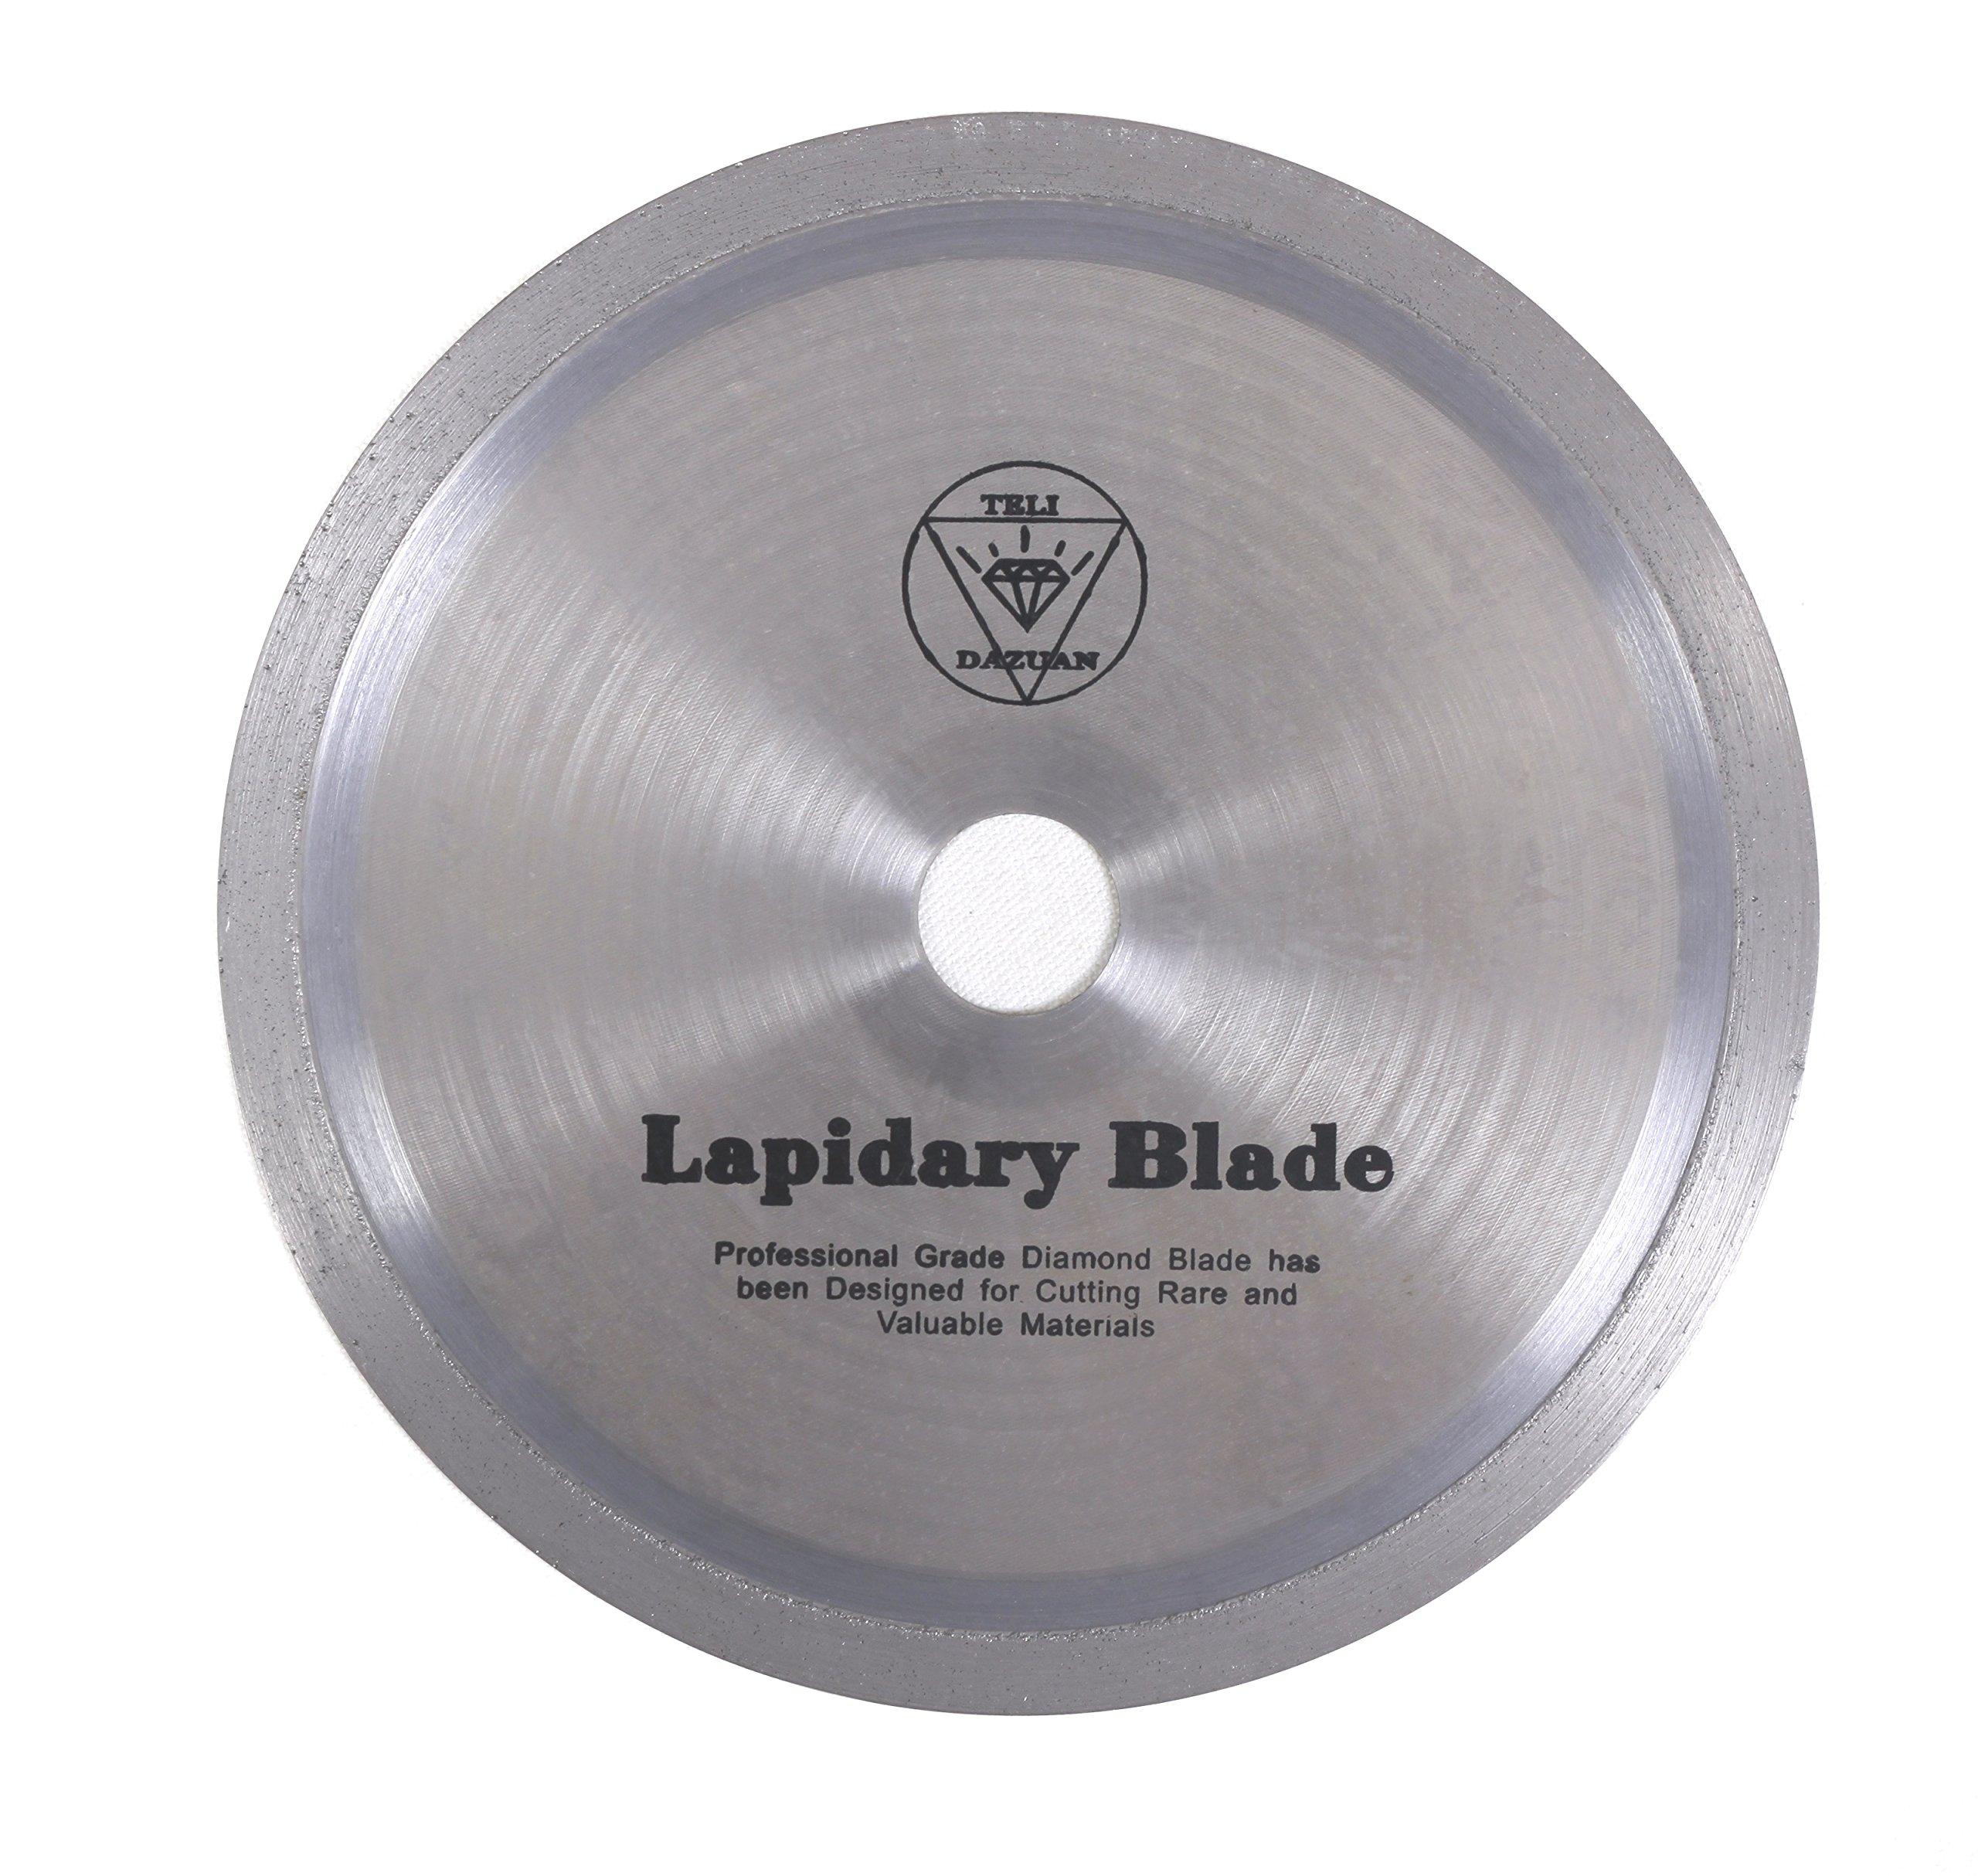 8-inch Professional Ultra Thin Diamond Lapidary Blade By 0.023-inch Wide By 1-inch (Attach a 5/8-inch Bushing) Arbor (Dazuan)